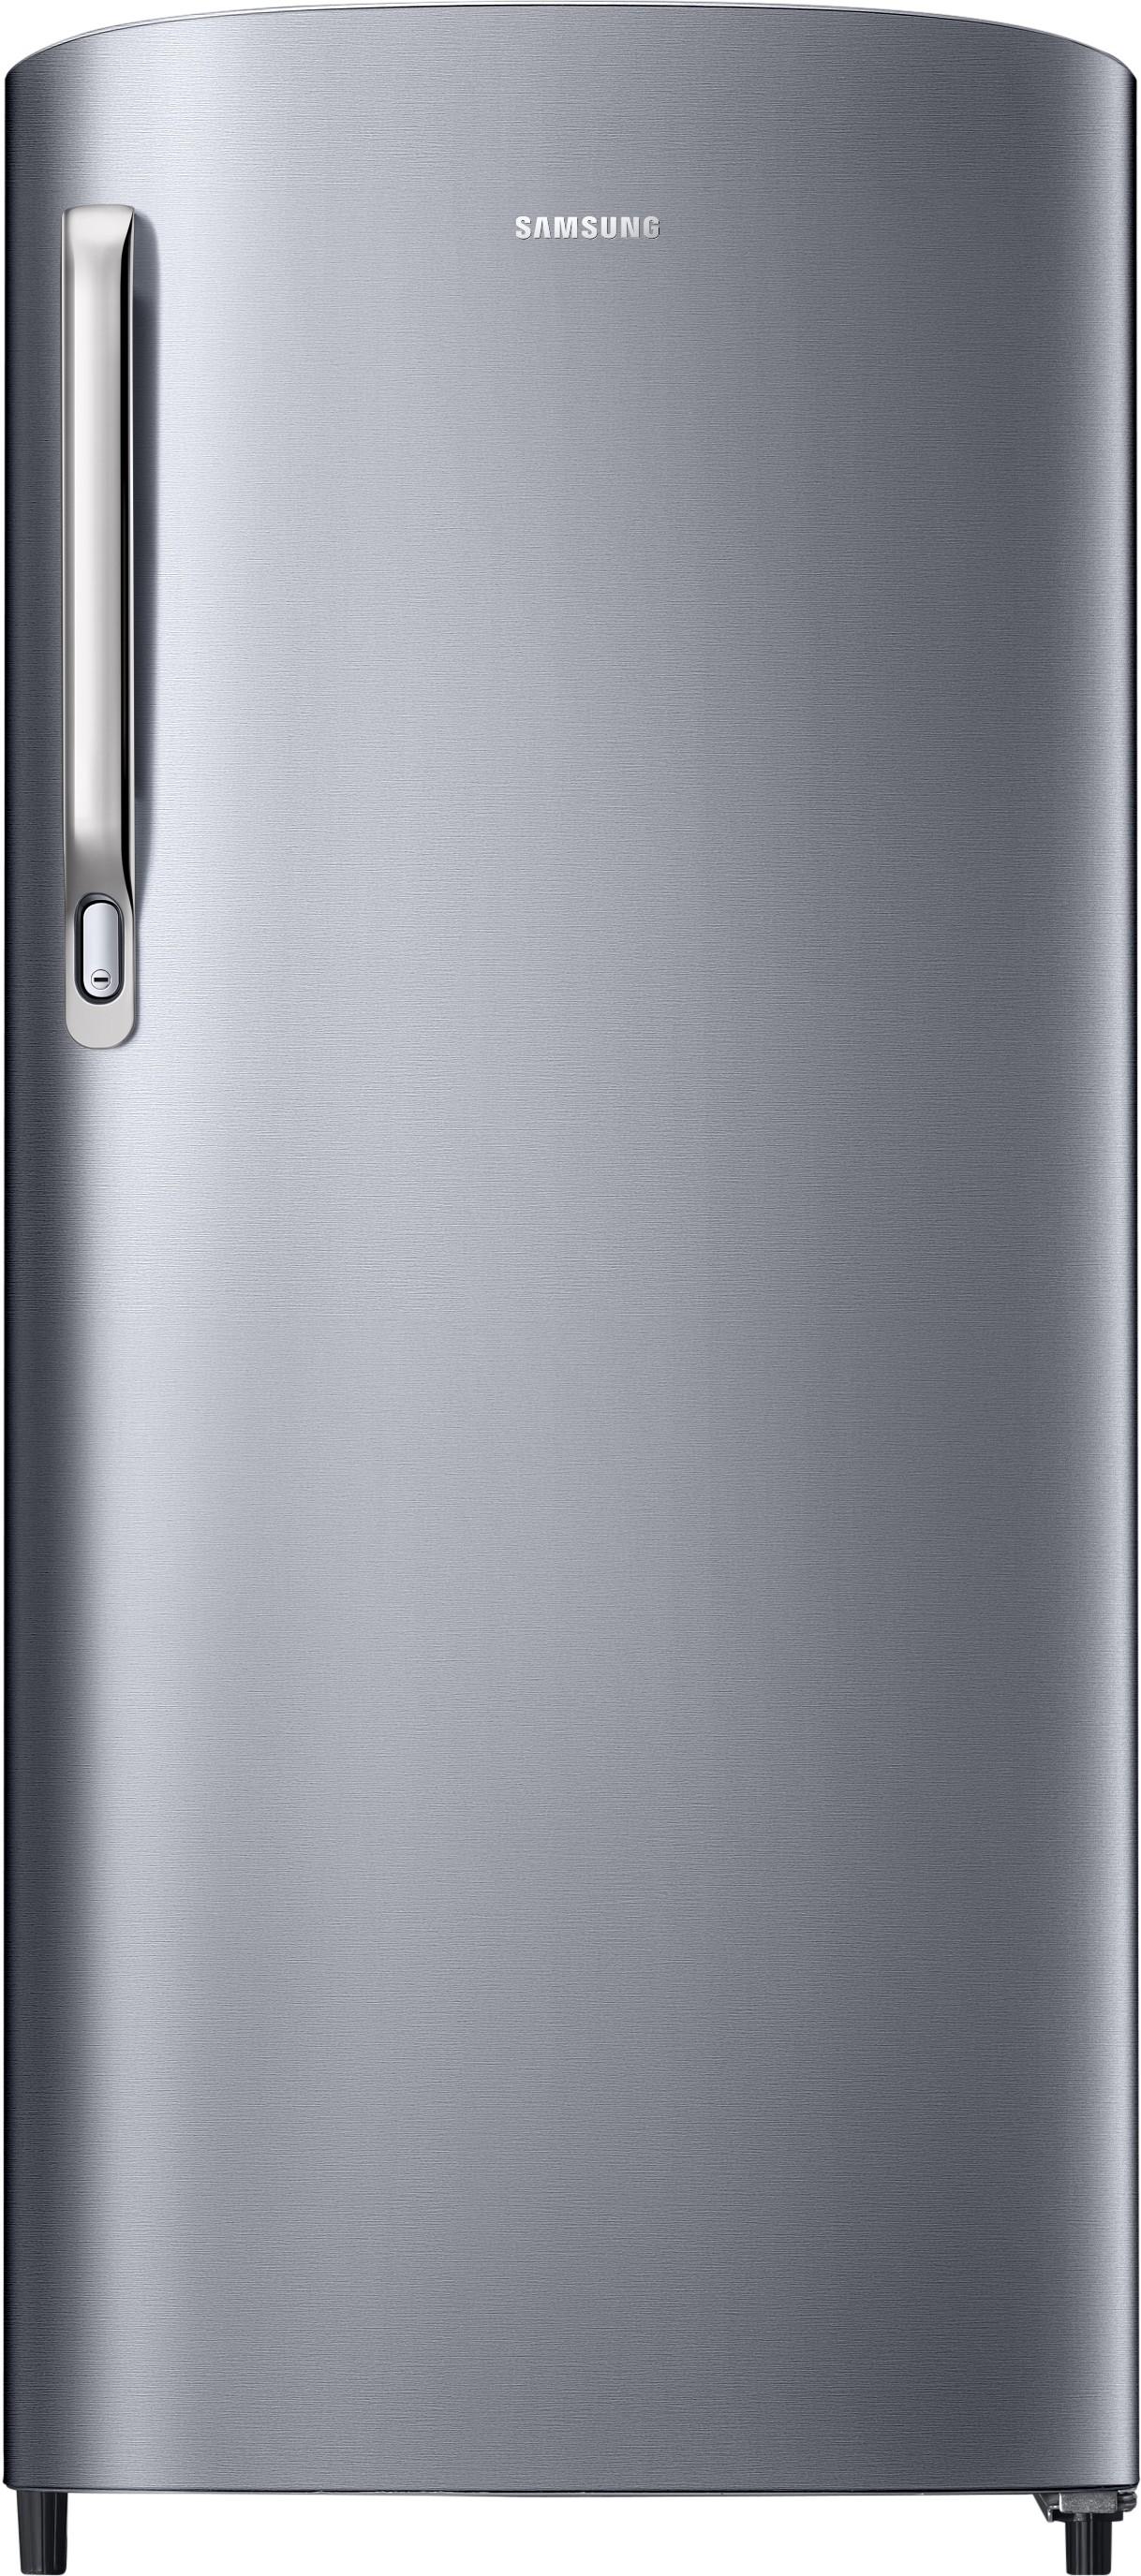 SAMSUNG 192 L Direct Cool Single Door Refrigerator(RR19M1412S8/HL, Elegant Inox, 2017) (Samsung) Tamil Nadu Buy Online